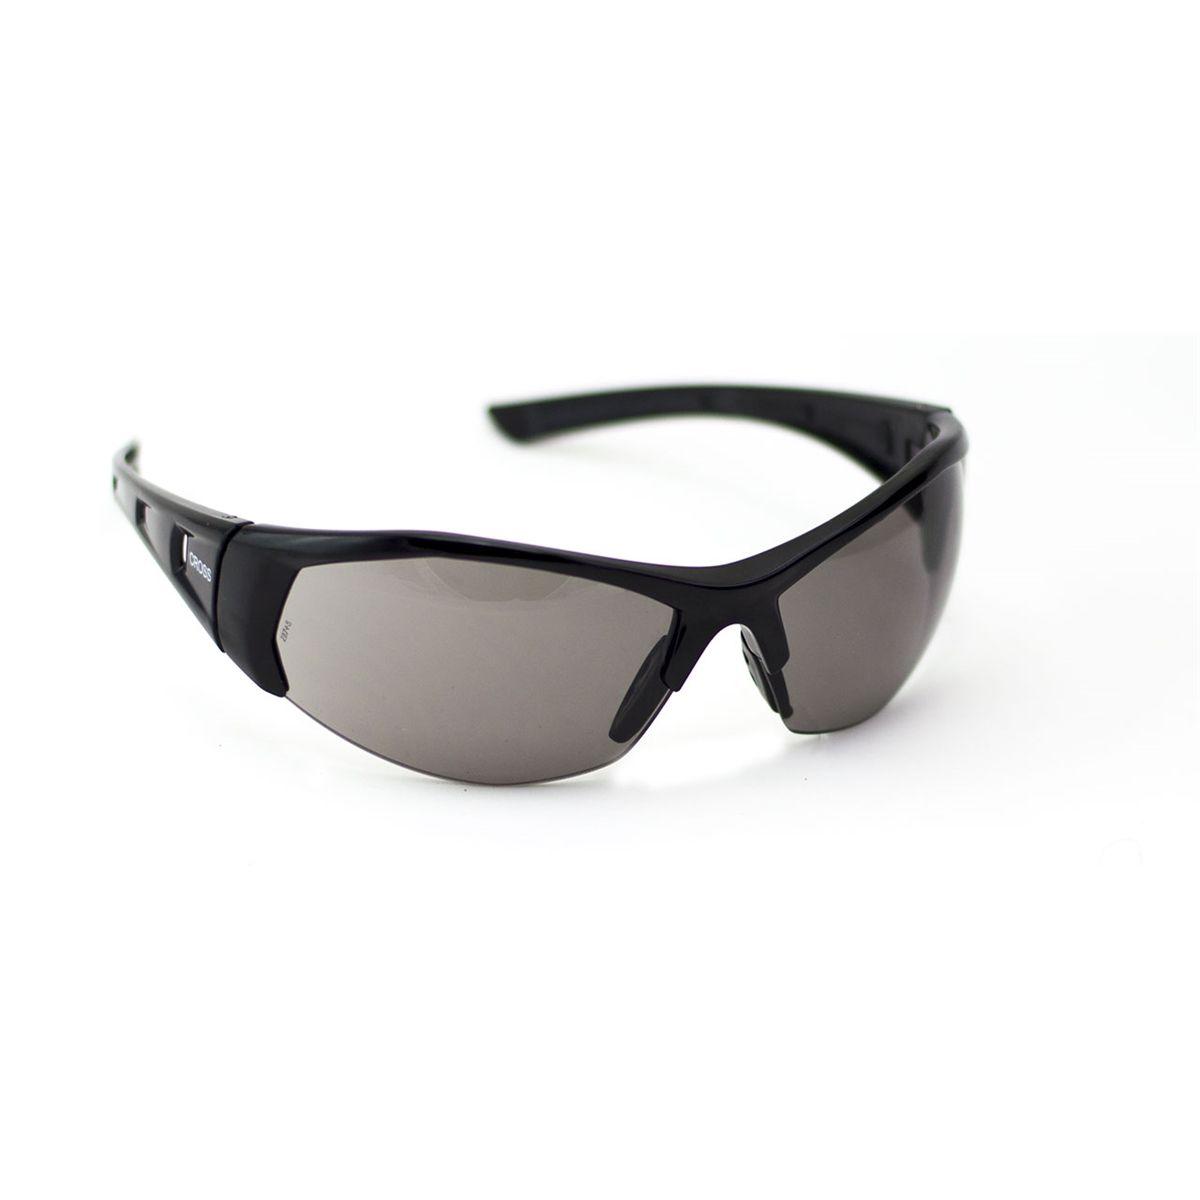 Óculos de Segurança - Militar Cross com Lente Cinza - STEEL PRO